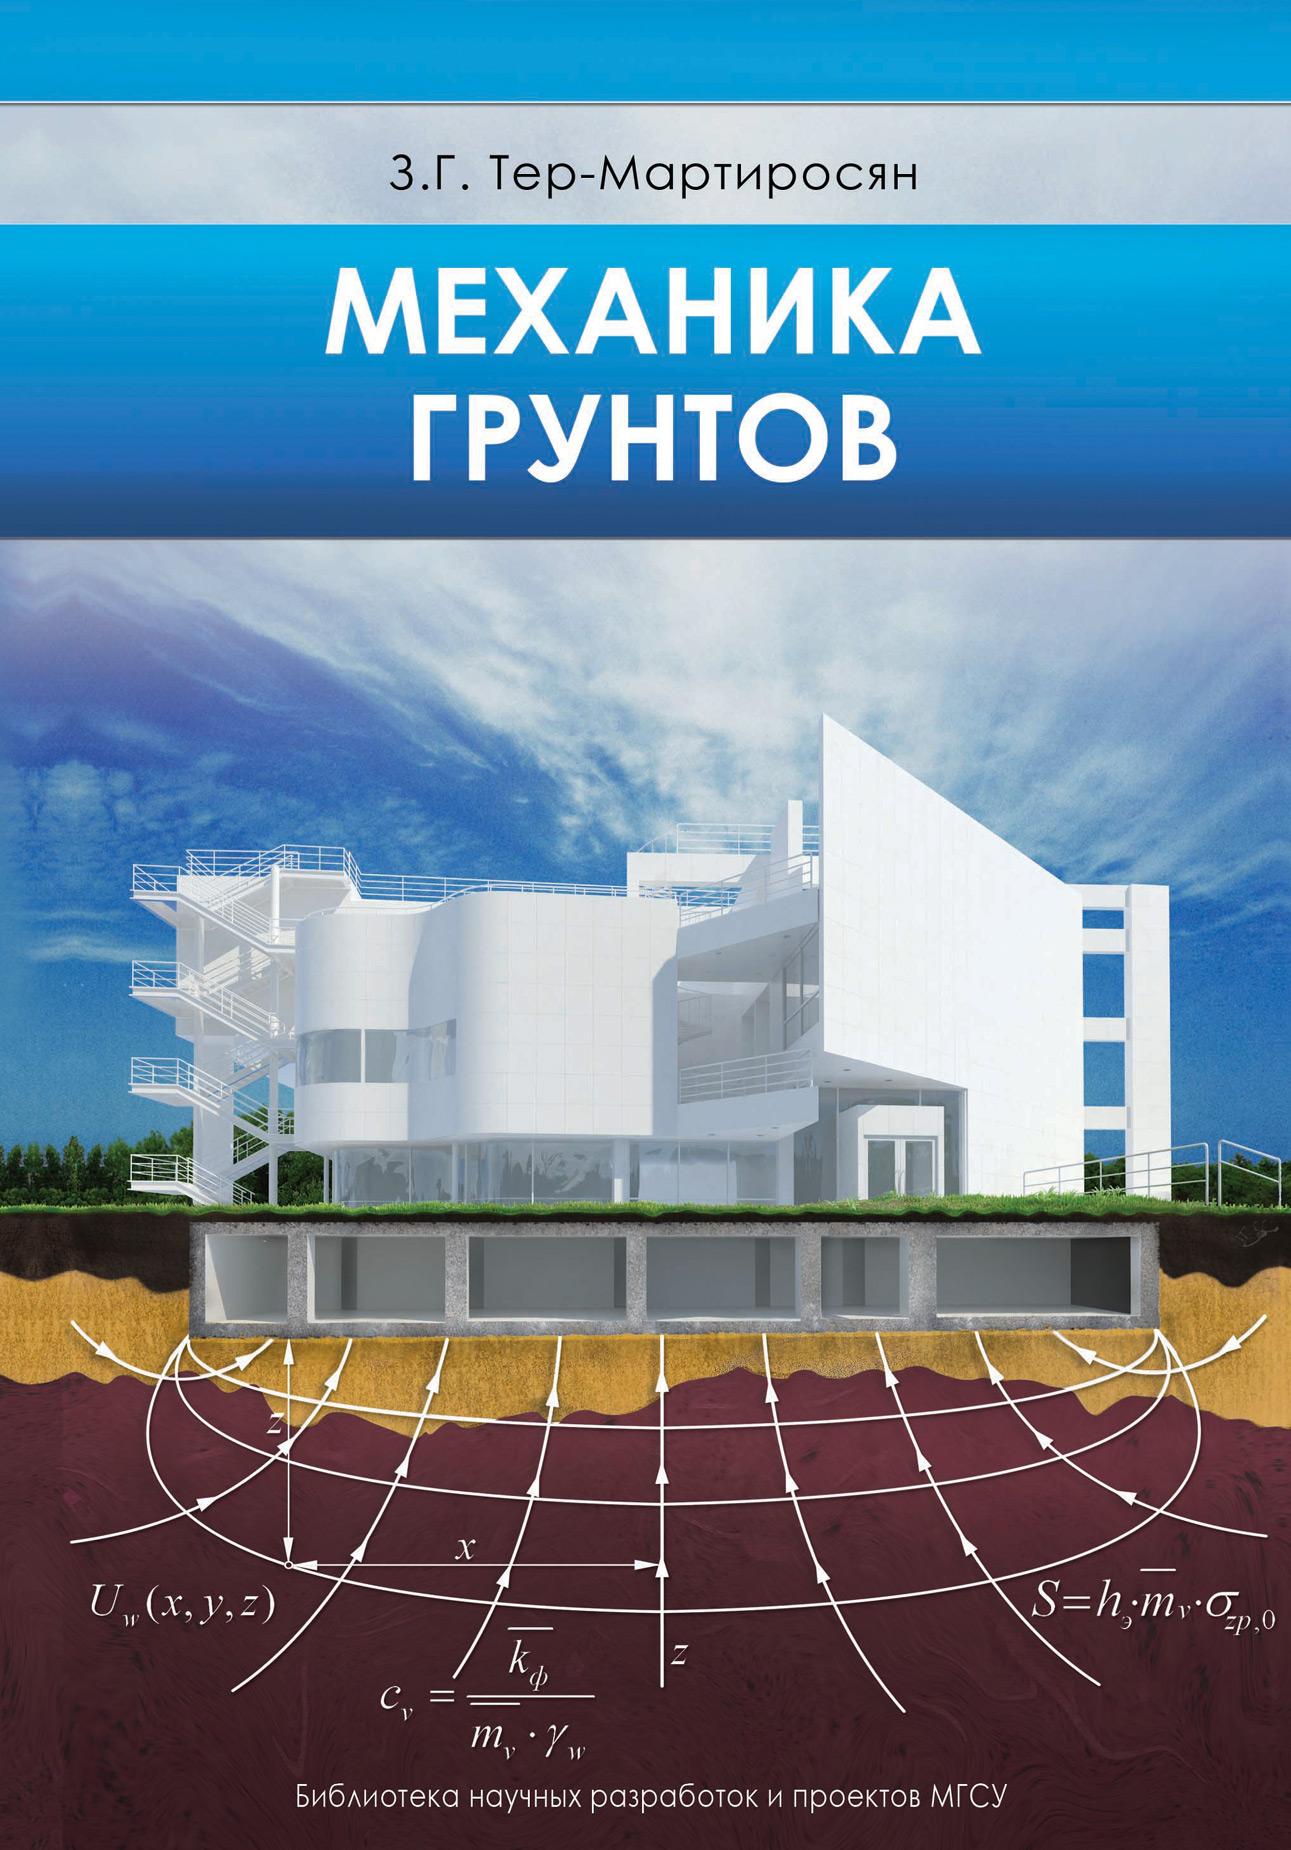 З. Г. Тер-Мартиросян Механика грунтов